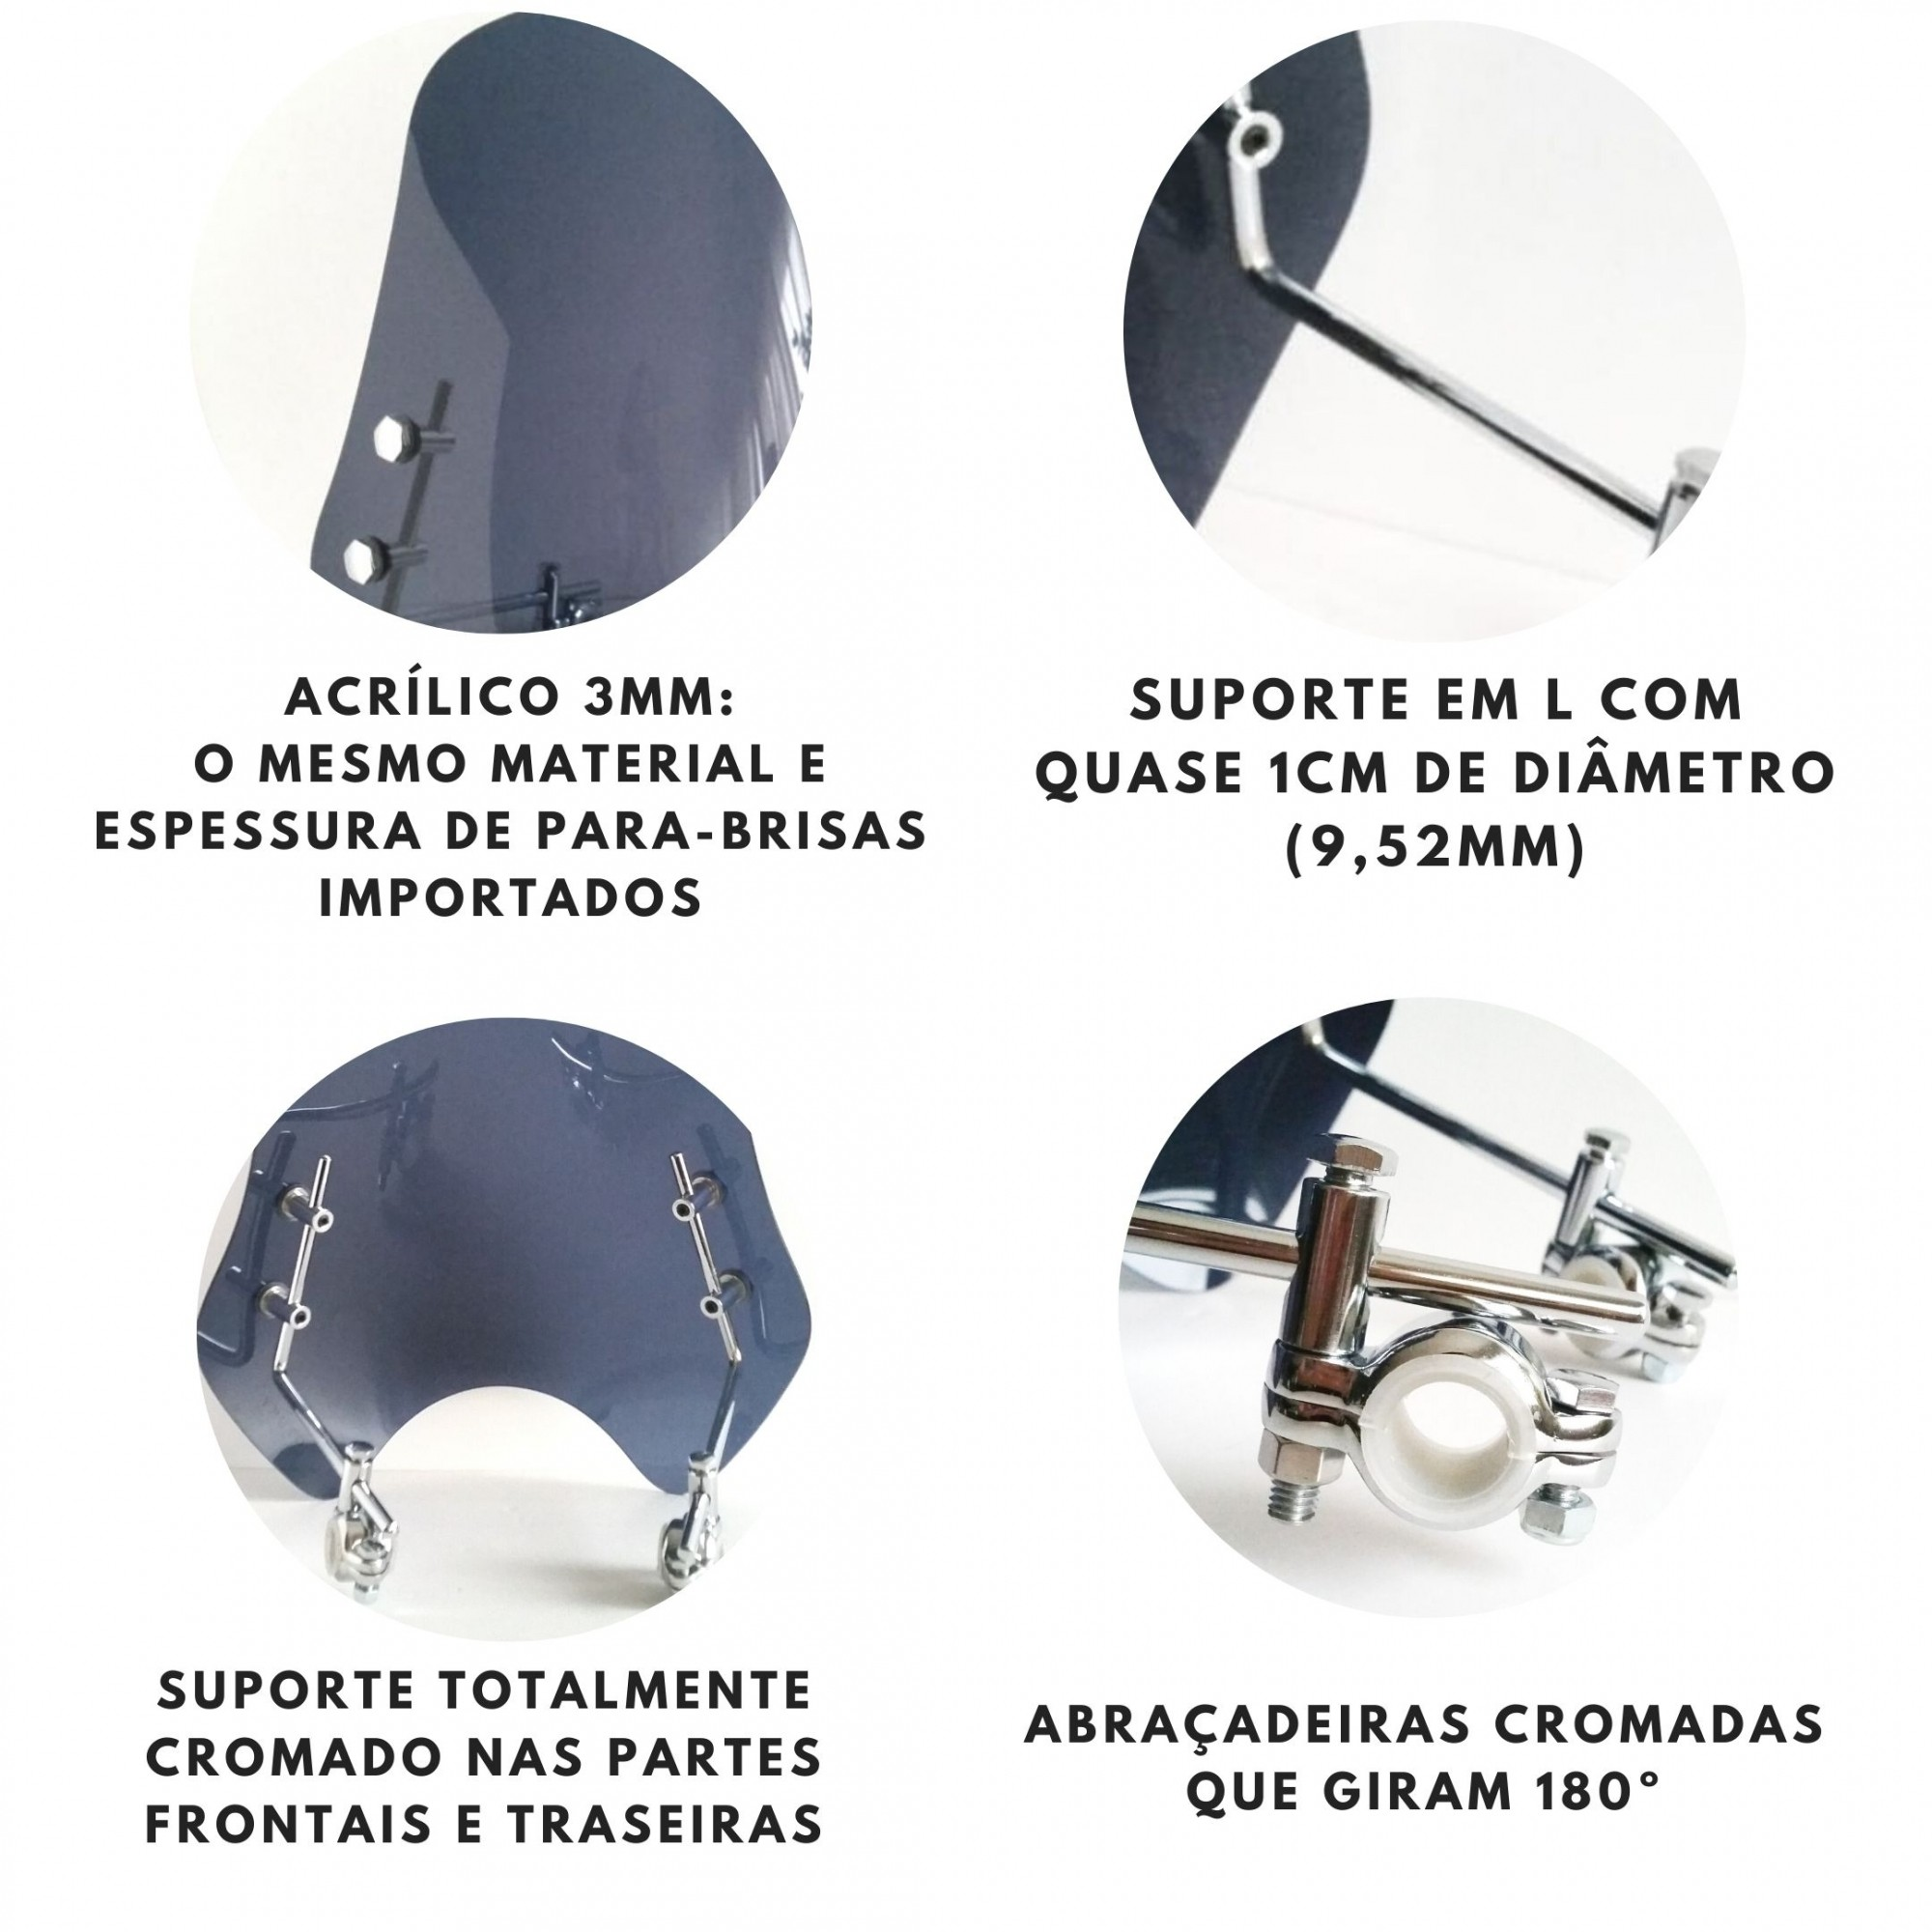 Parabrisa Universal Suporte Cromado blackstar fenix AJ700 Fumê Cinza